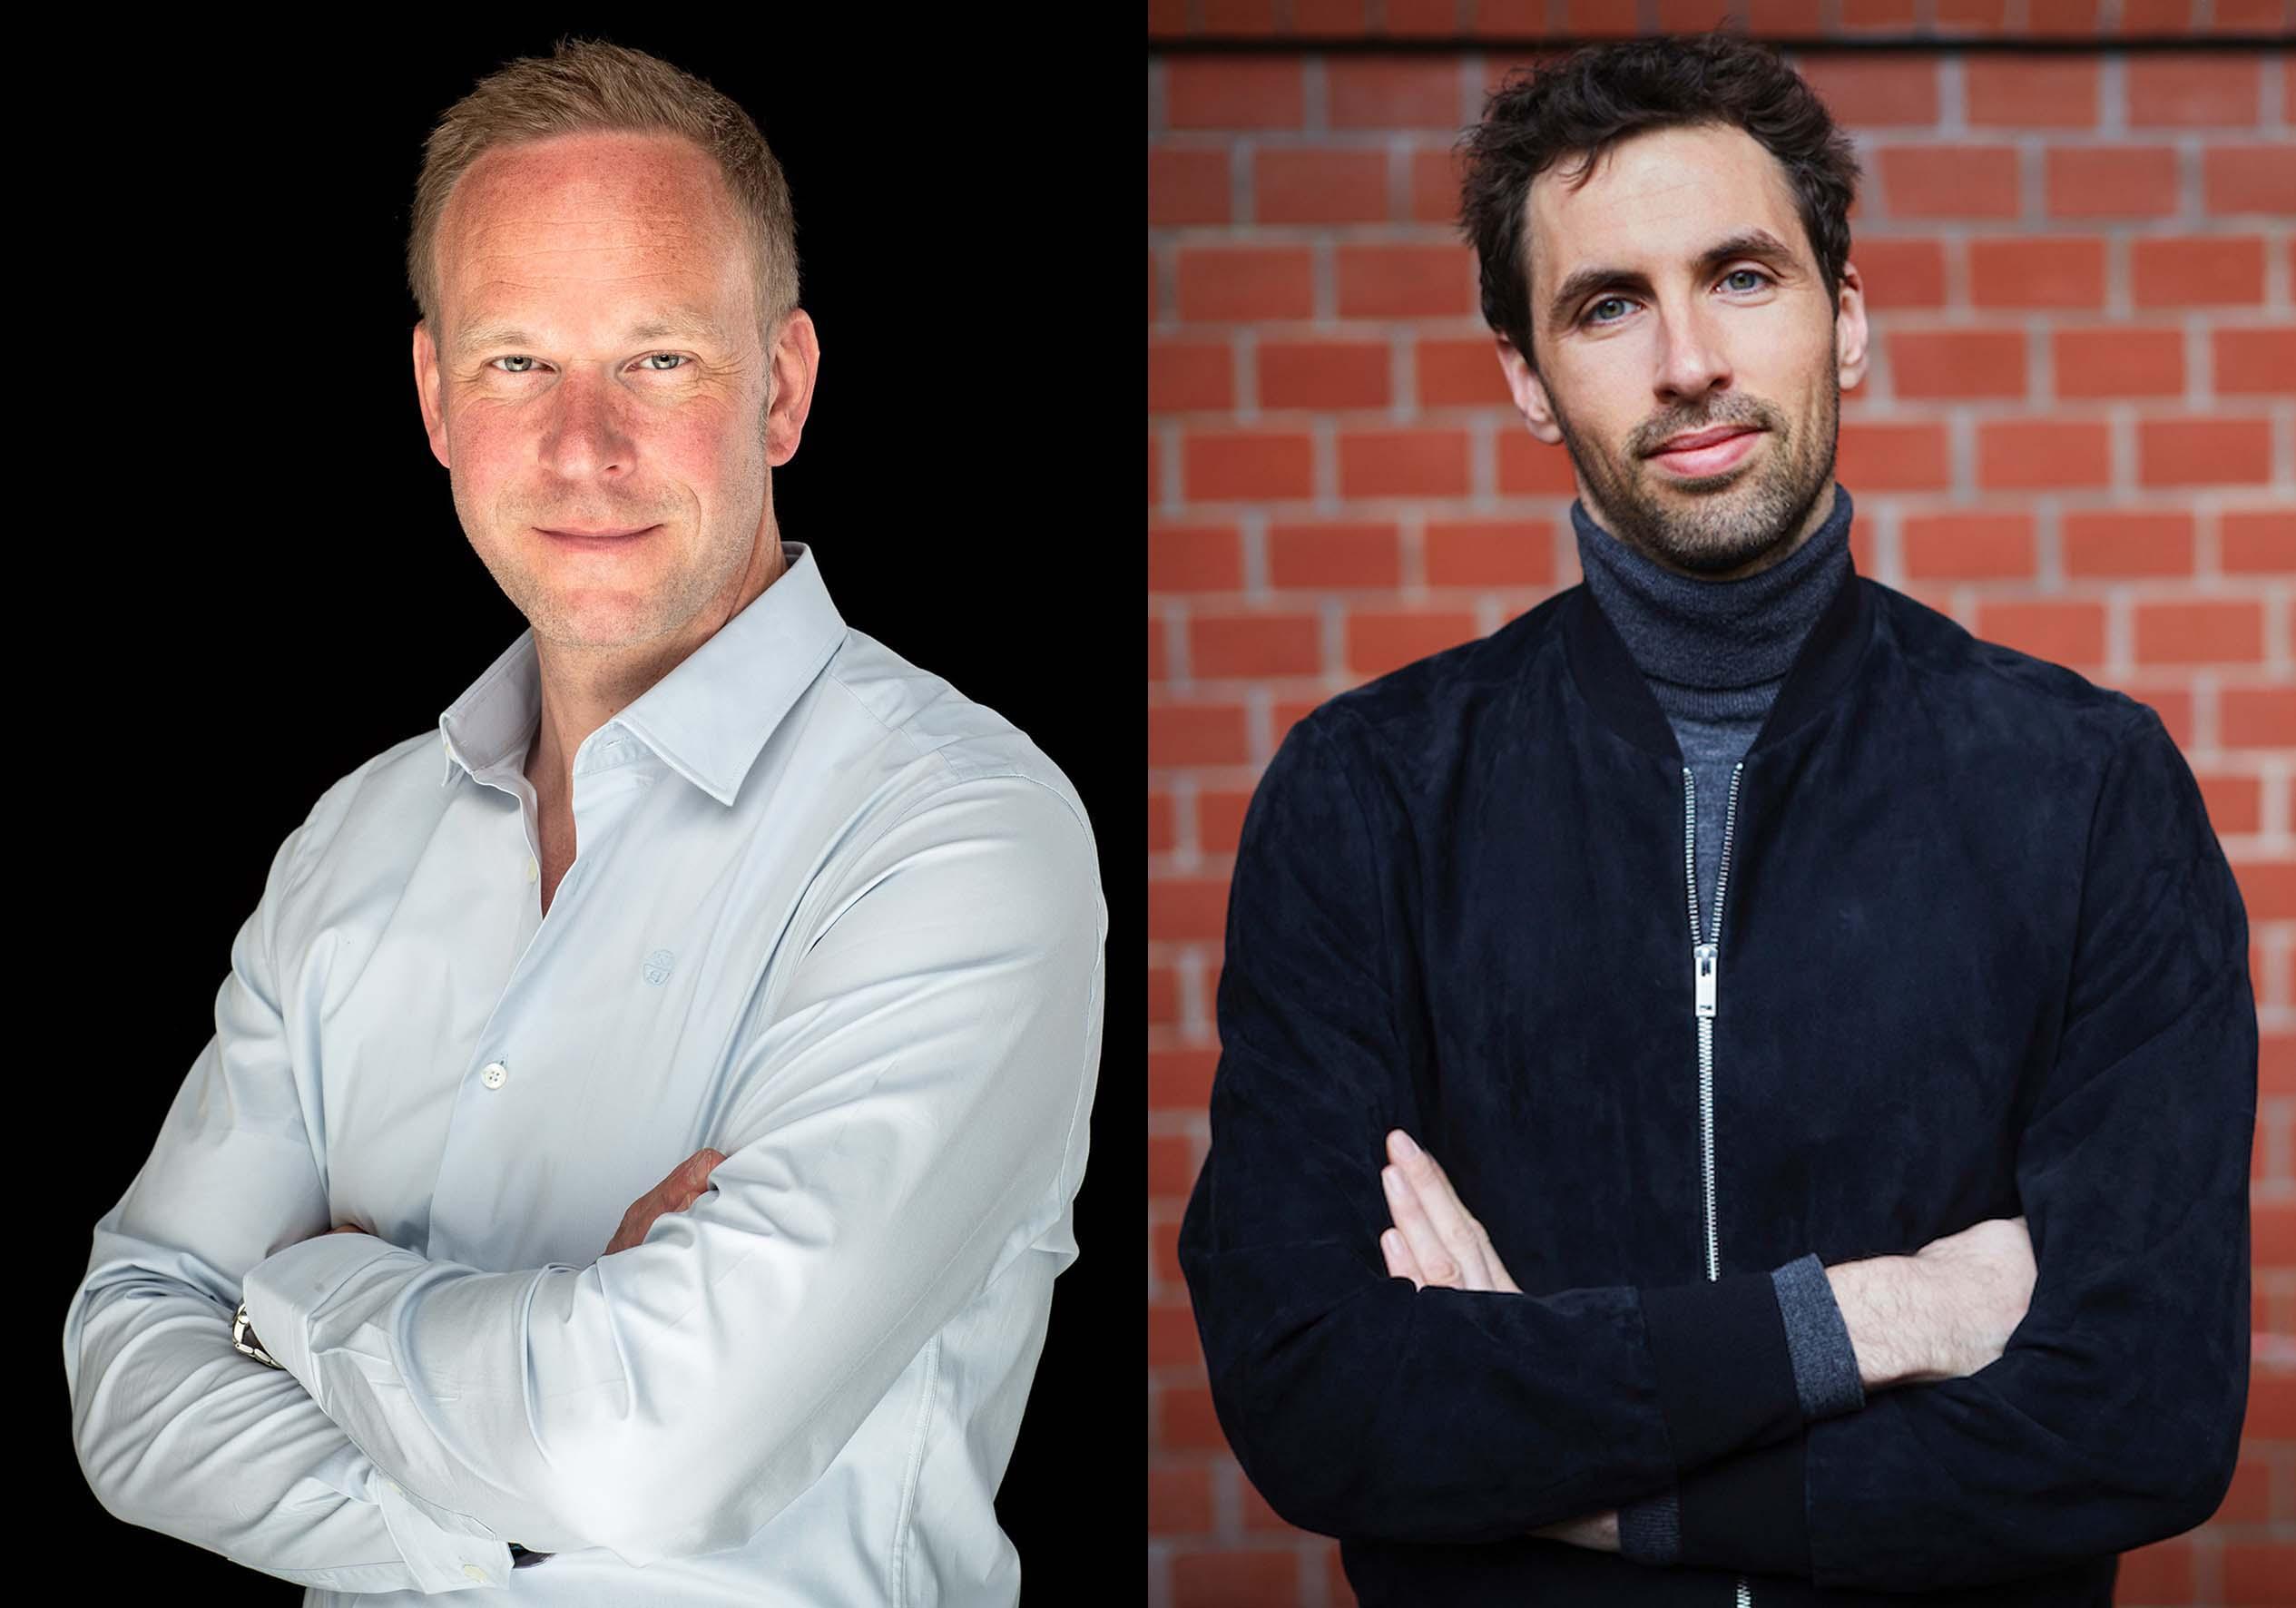 Daniel Neuhaus, CEO YK Group and Dennis Kallerhoff, Managing Director shopping24